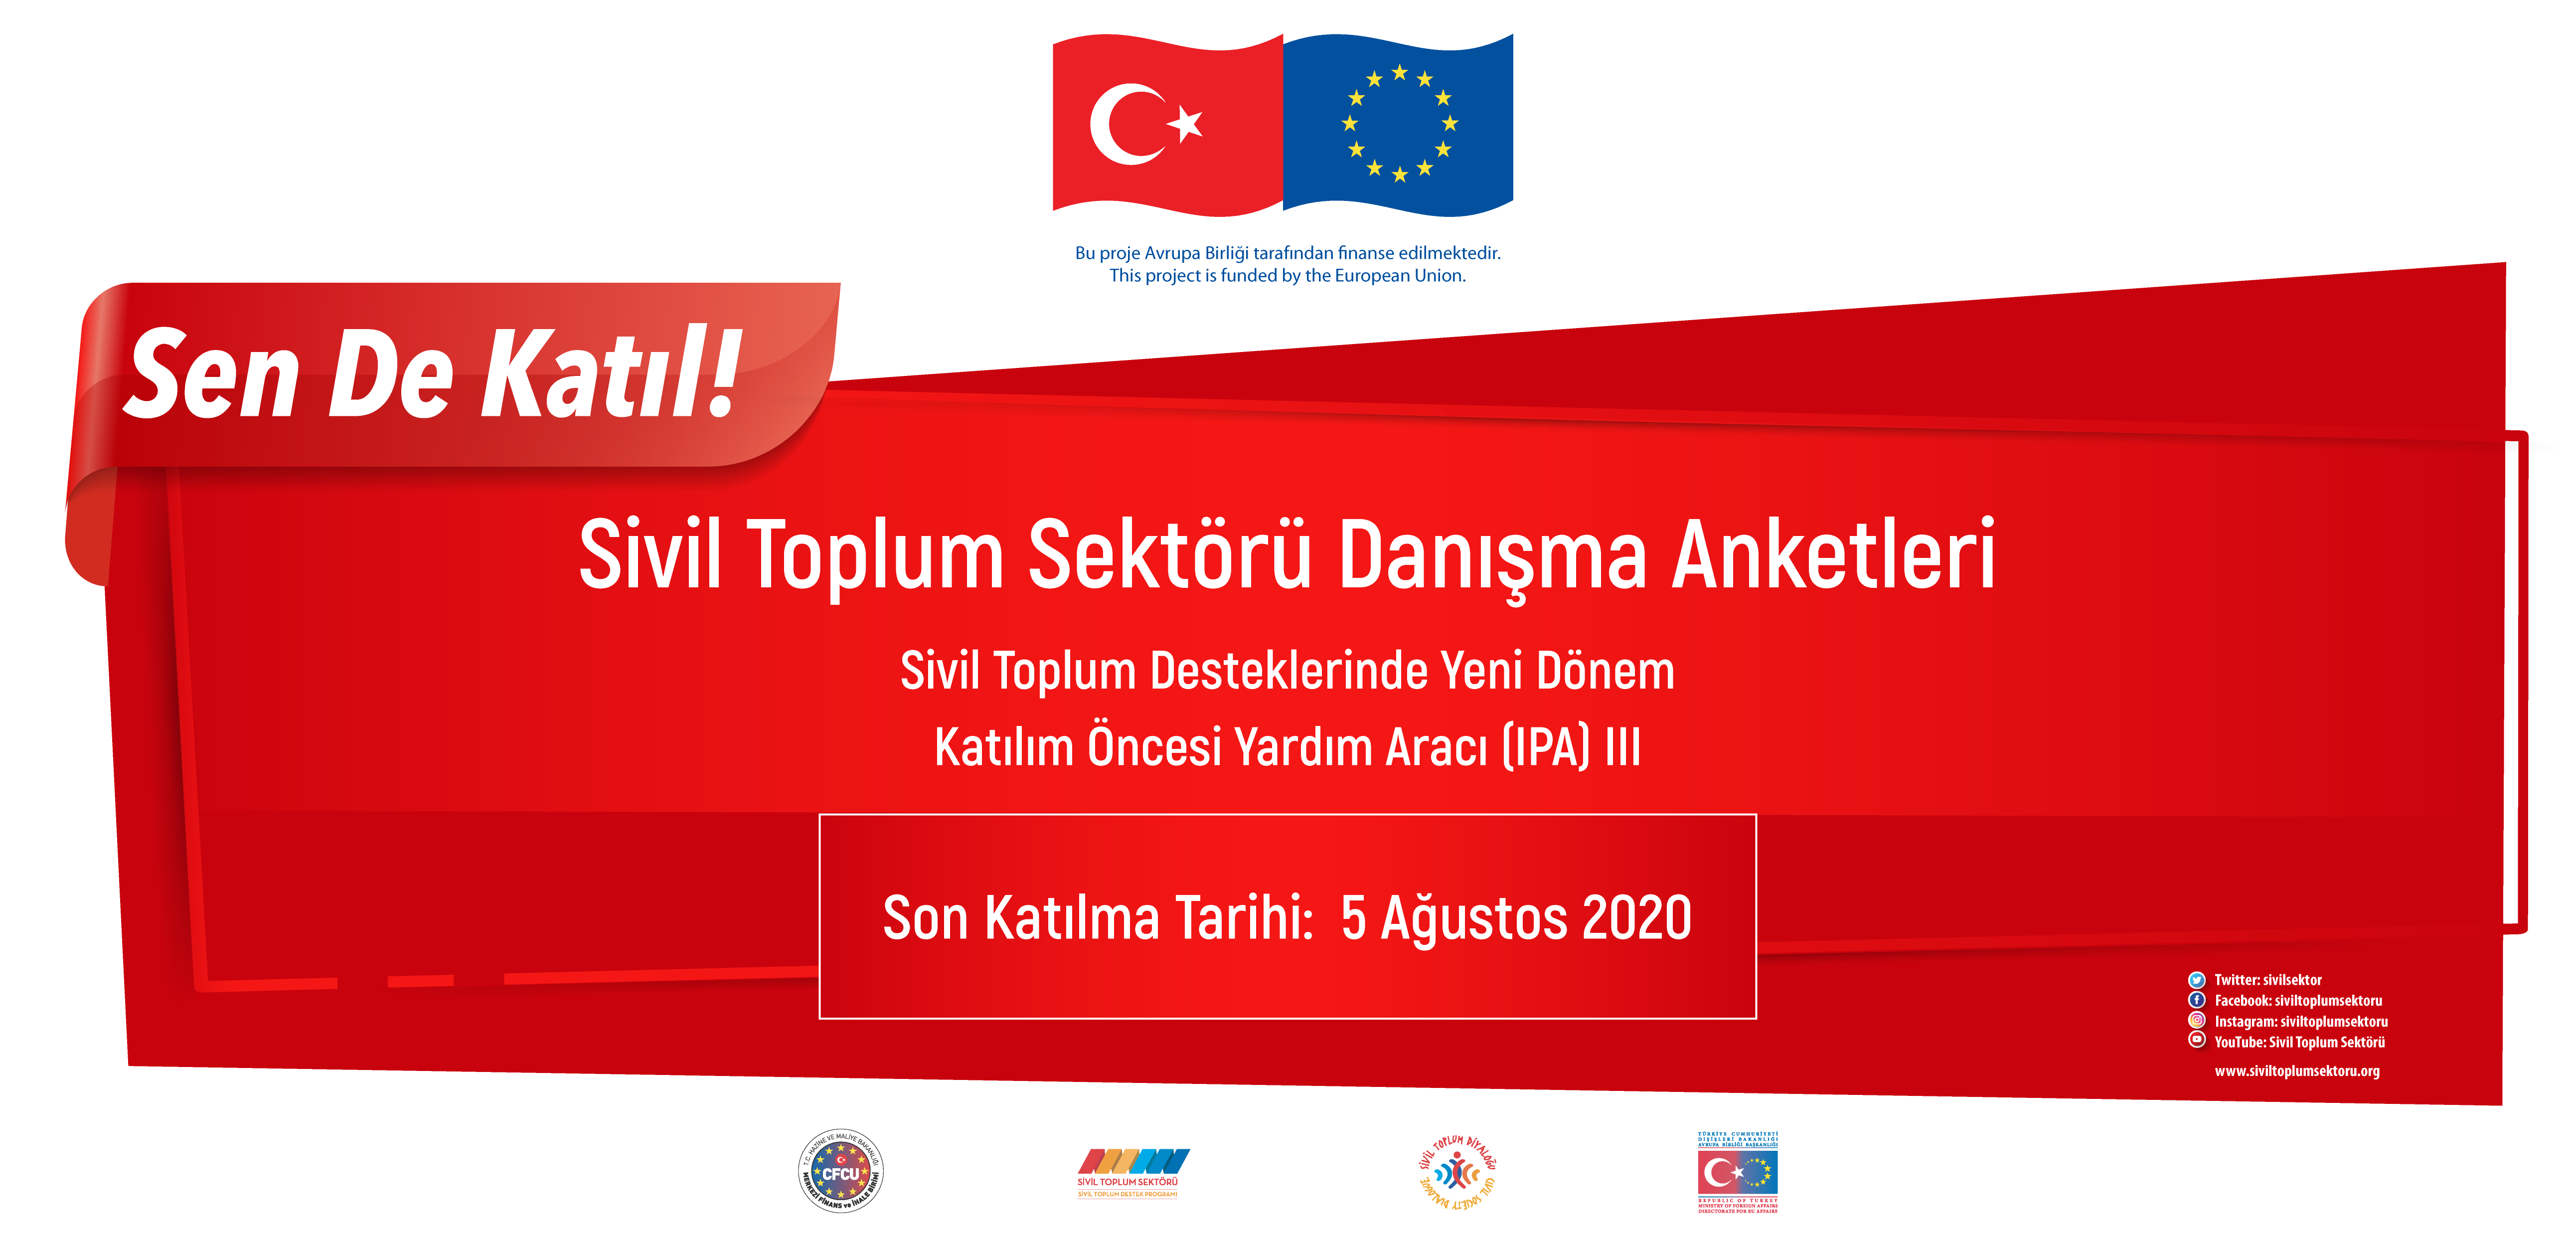 (Turkish) Sen De Katıl!